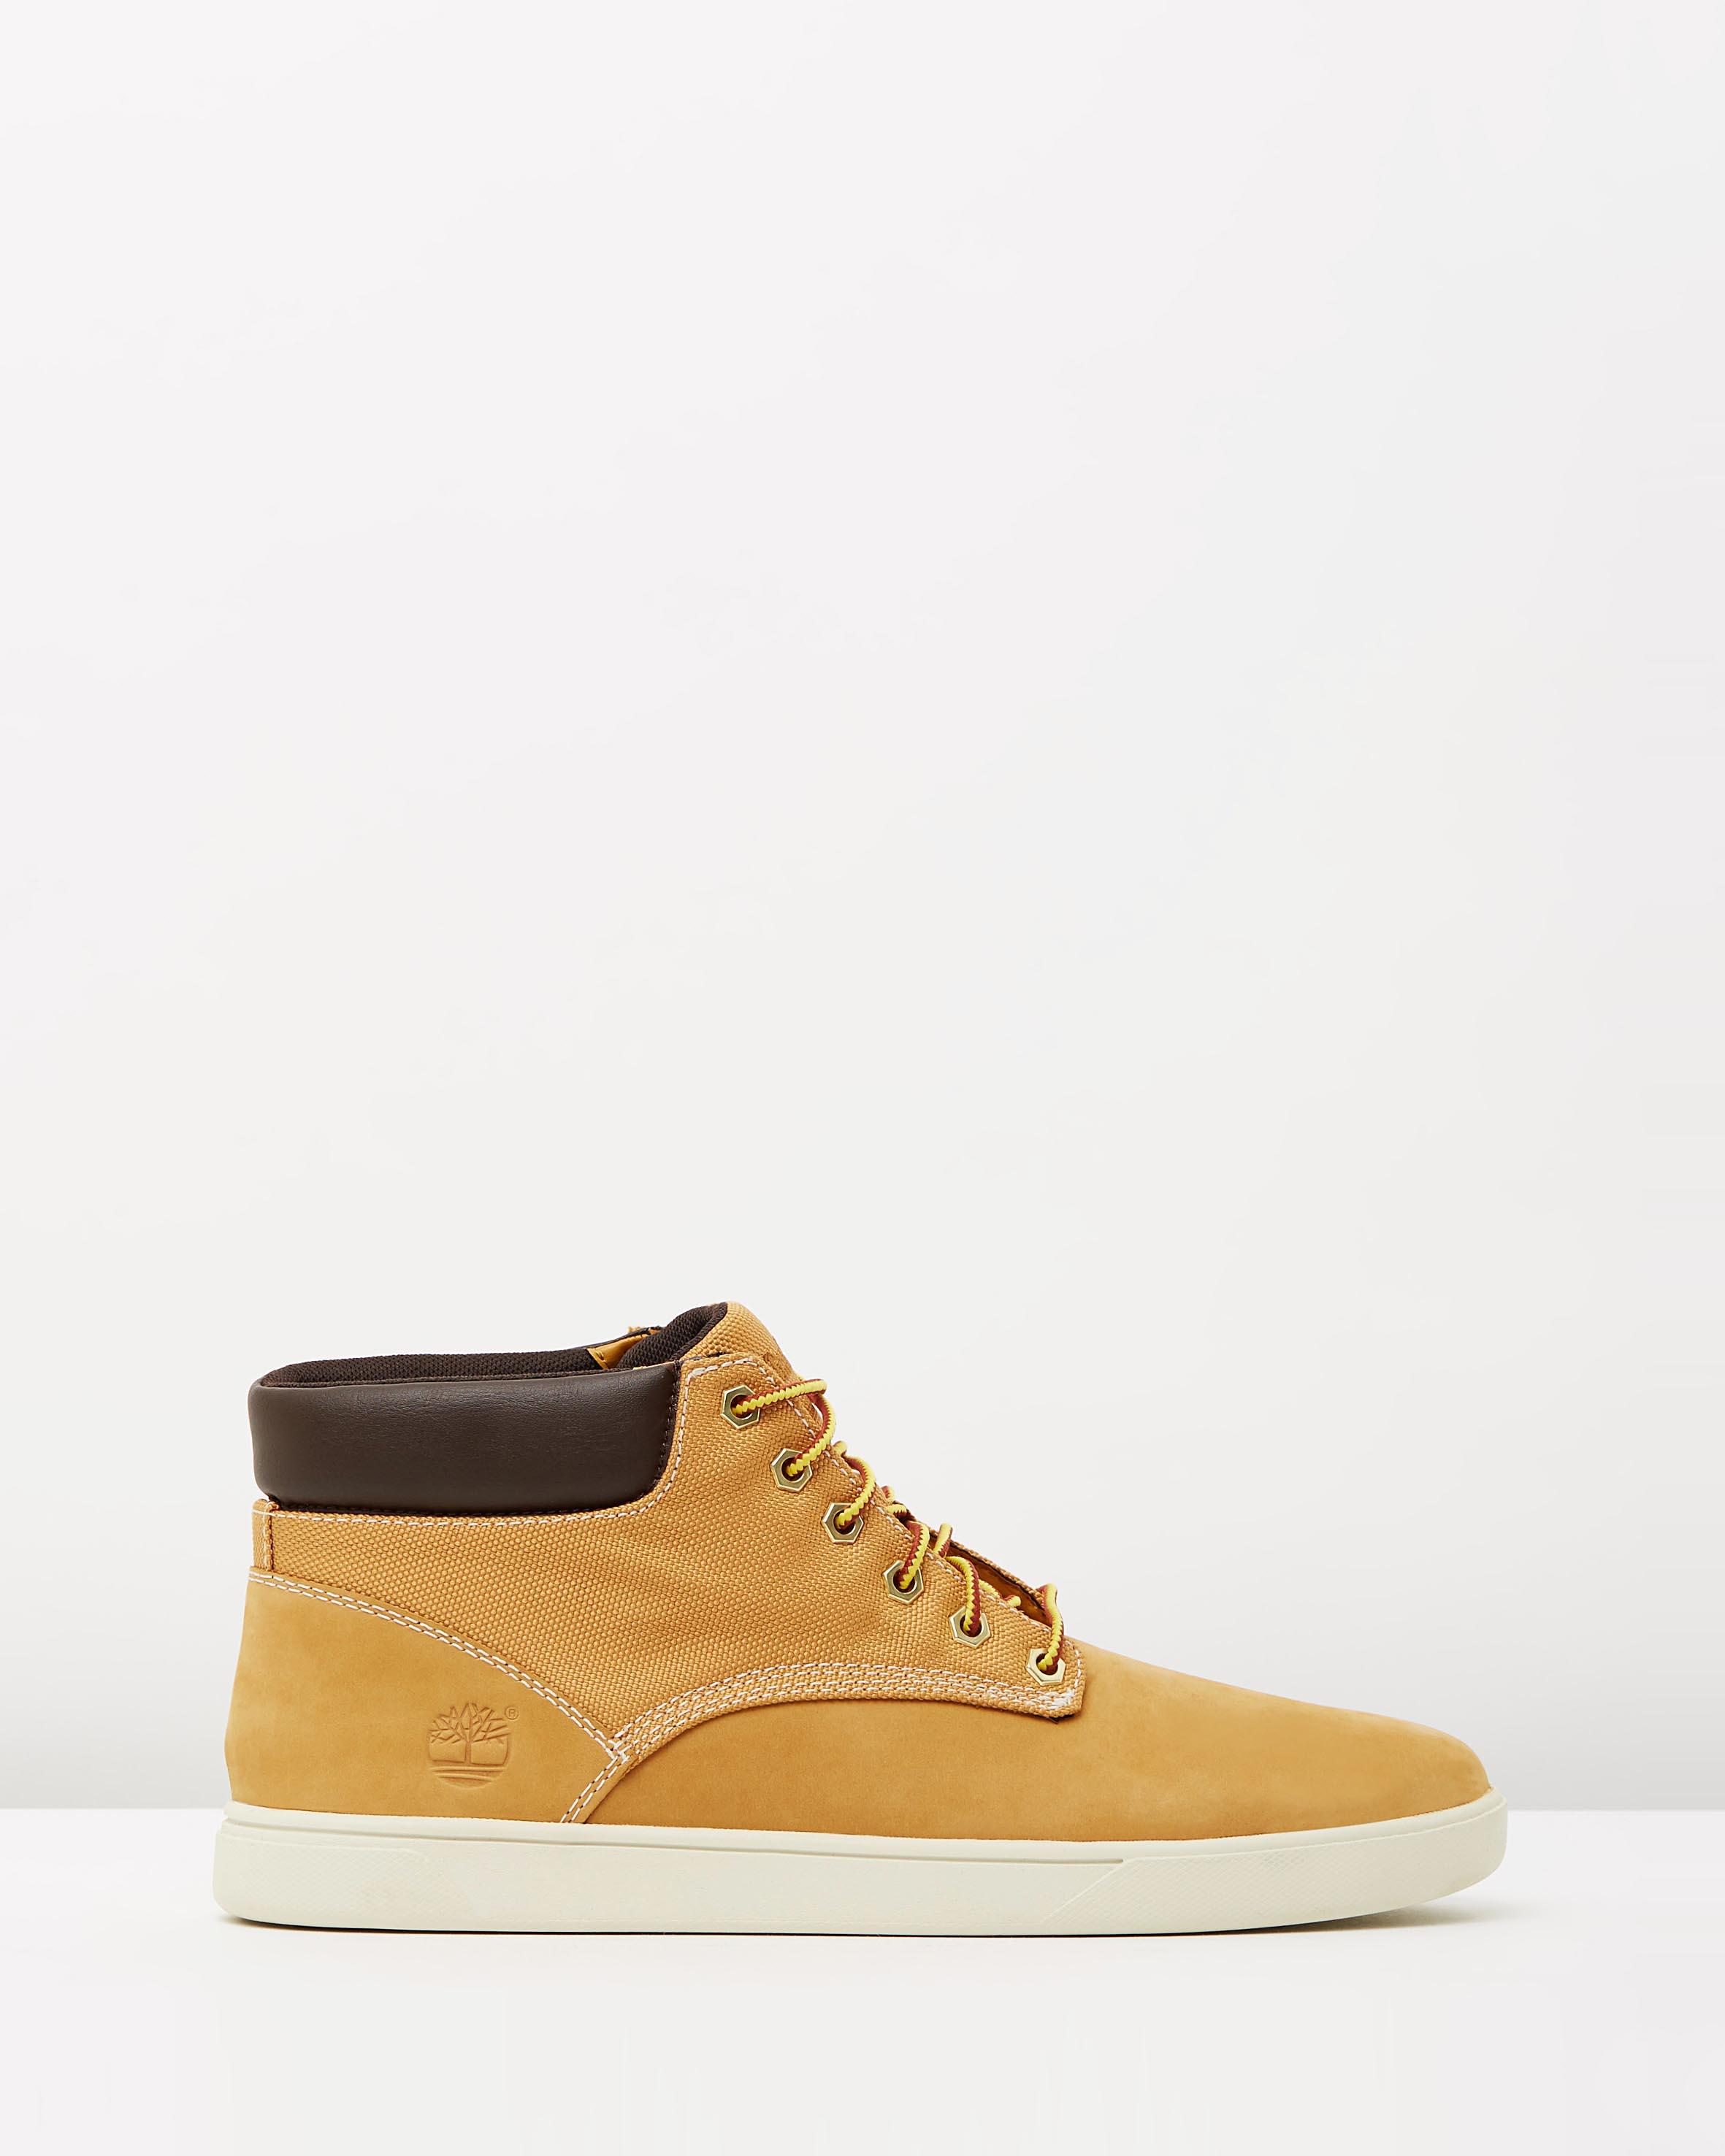 The vegetable garden - Timberland Shoes Sale Australia Startorganic Vegetable